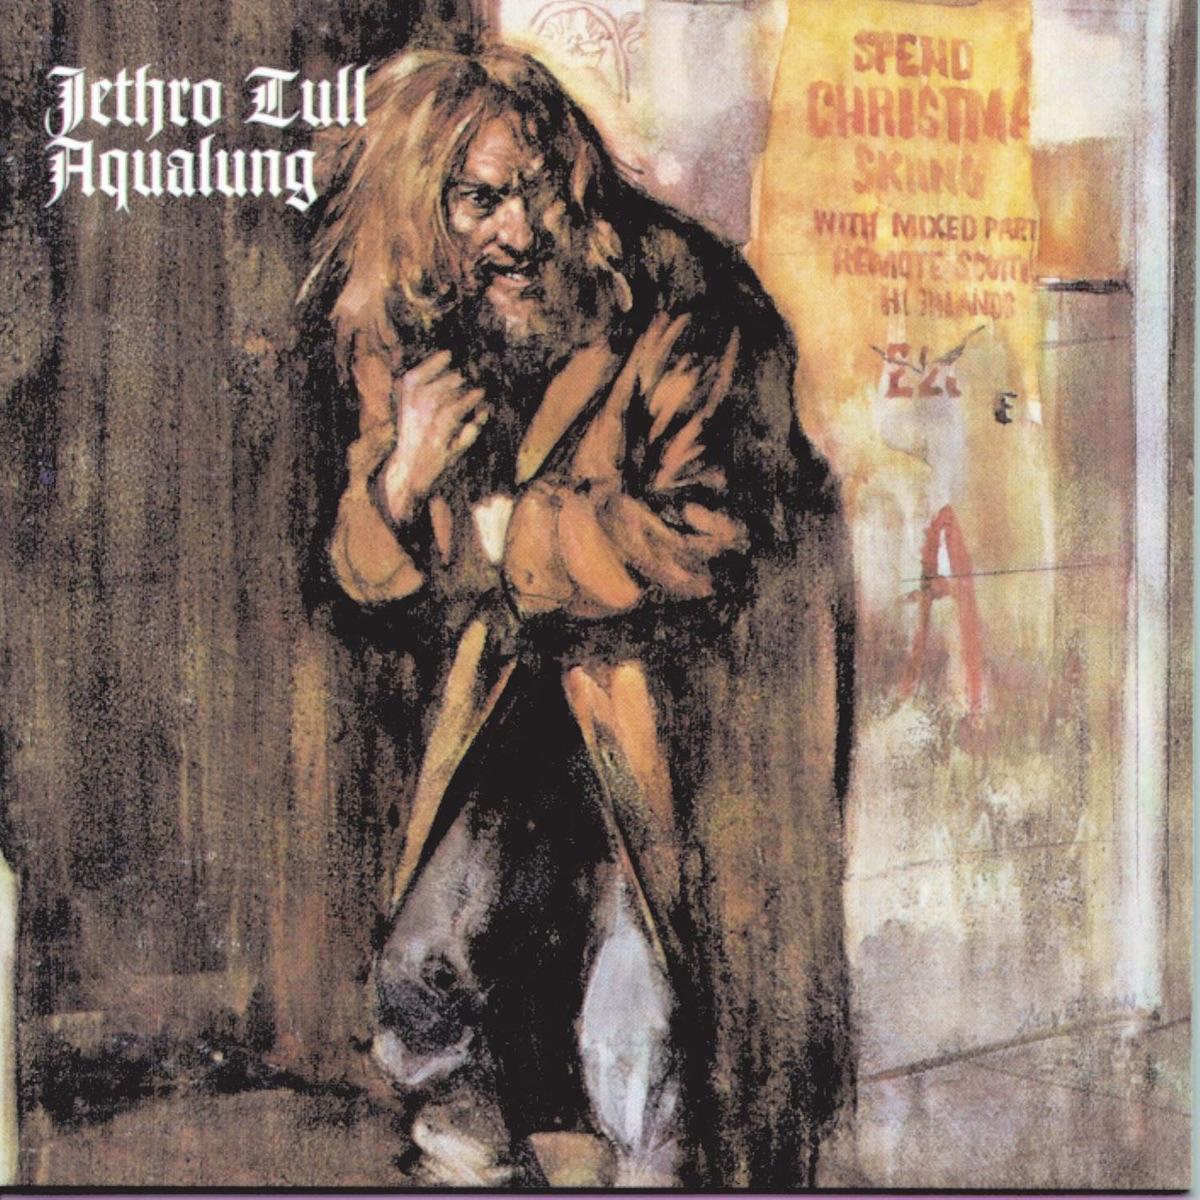 Aqualung Album Cover by Jethro Tull